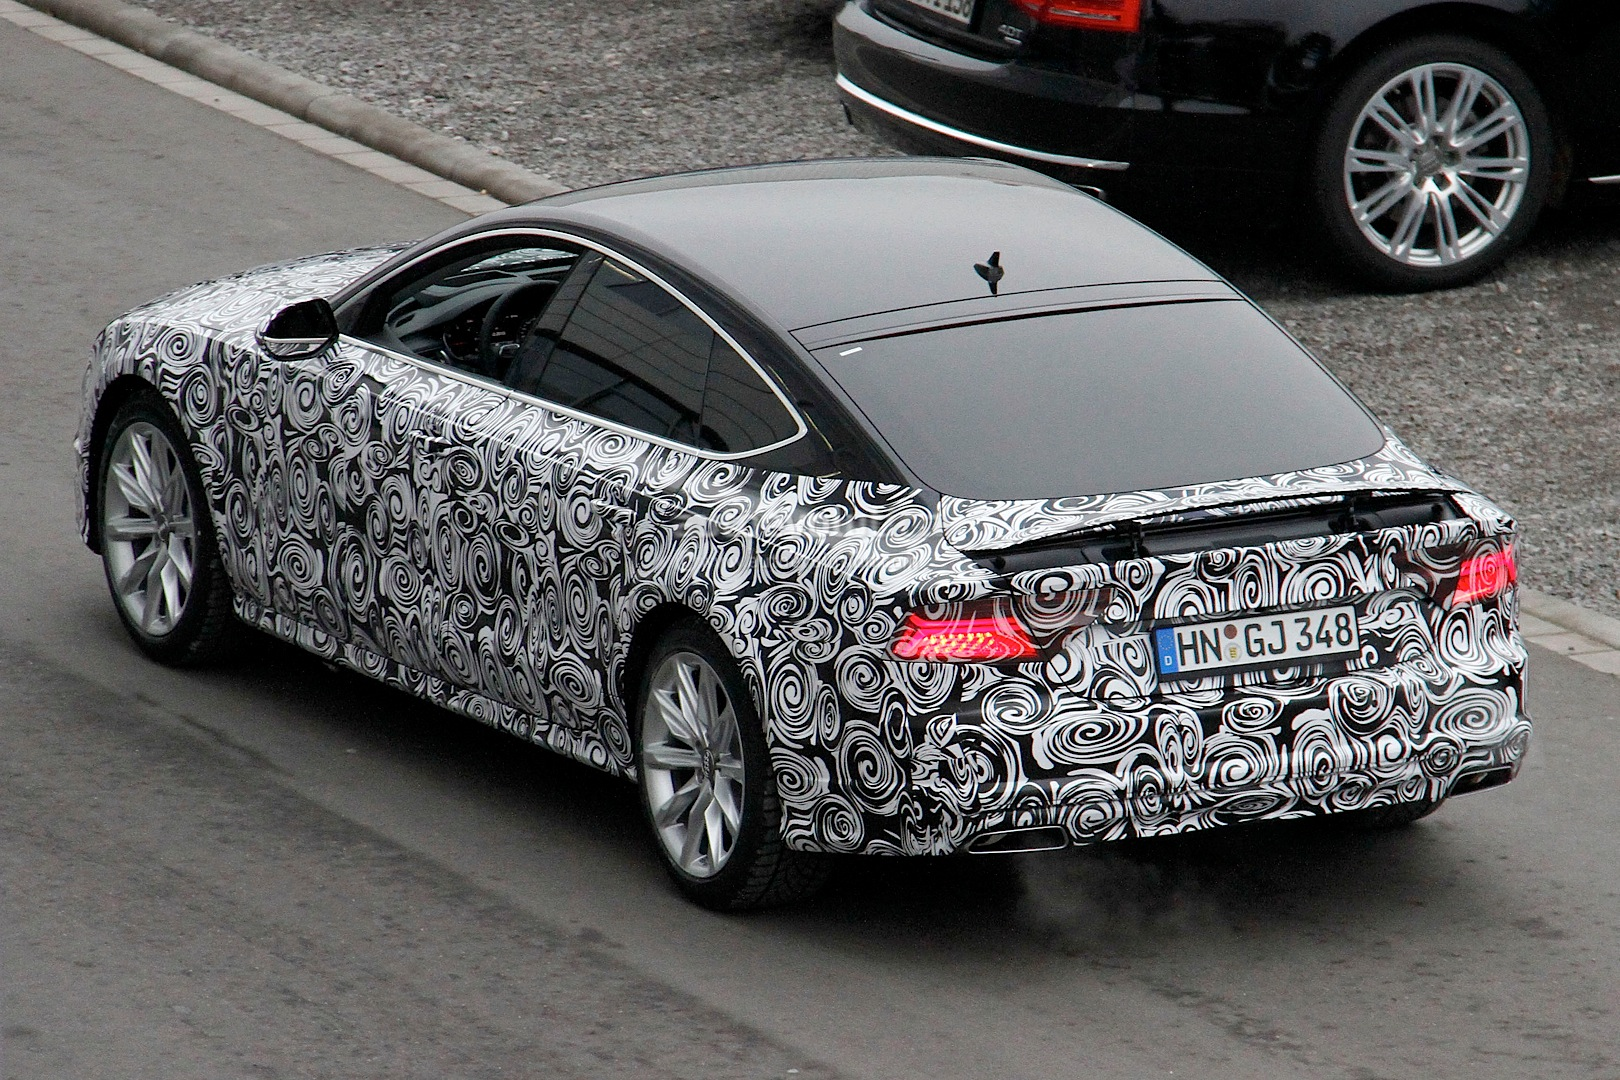 2014 - [Audi] A7 & S7 Sportback Restylée Spyshots-audi-a7-facelift-gets-new-headlight-design-1080p-5